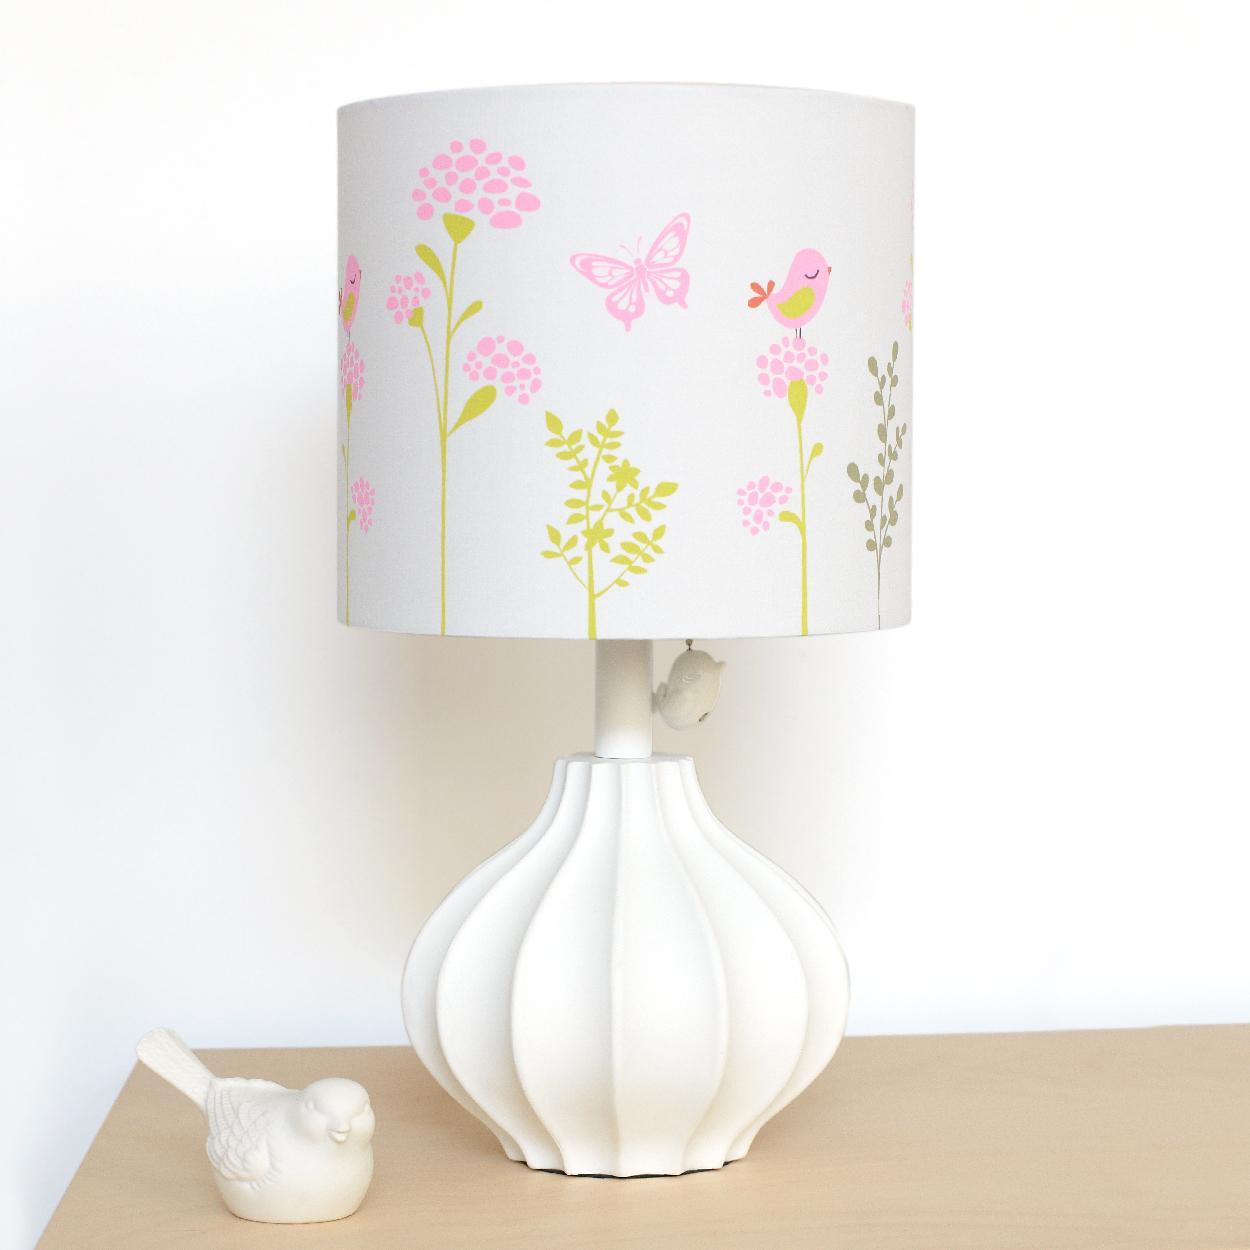 Amazon.com : Just Born Nursery Lamp, Botanica Collection w